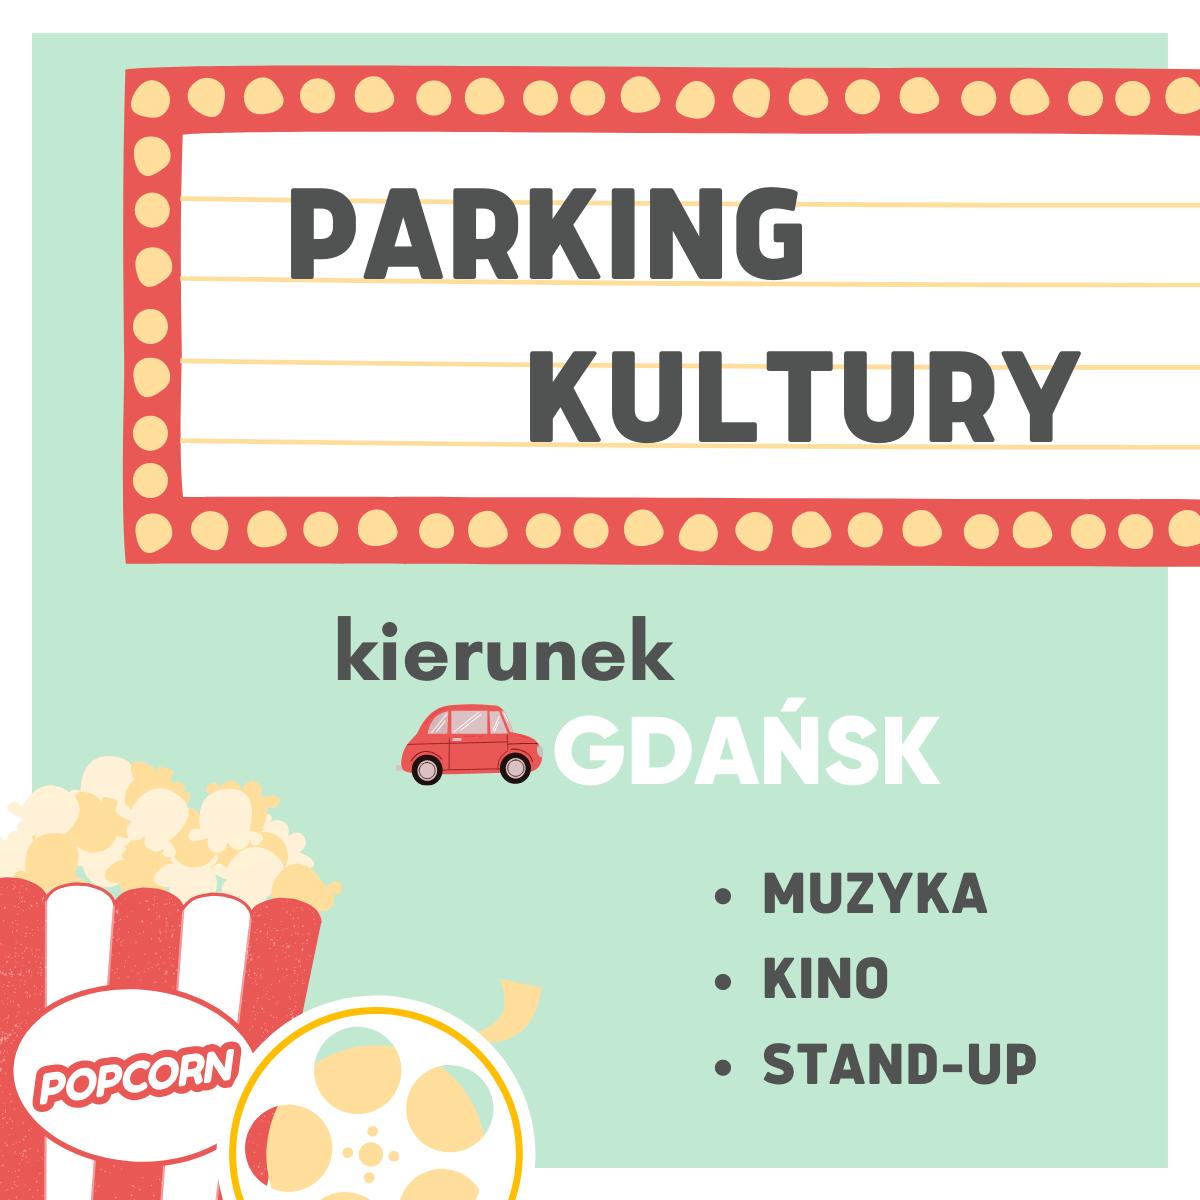 Parking Kultury